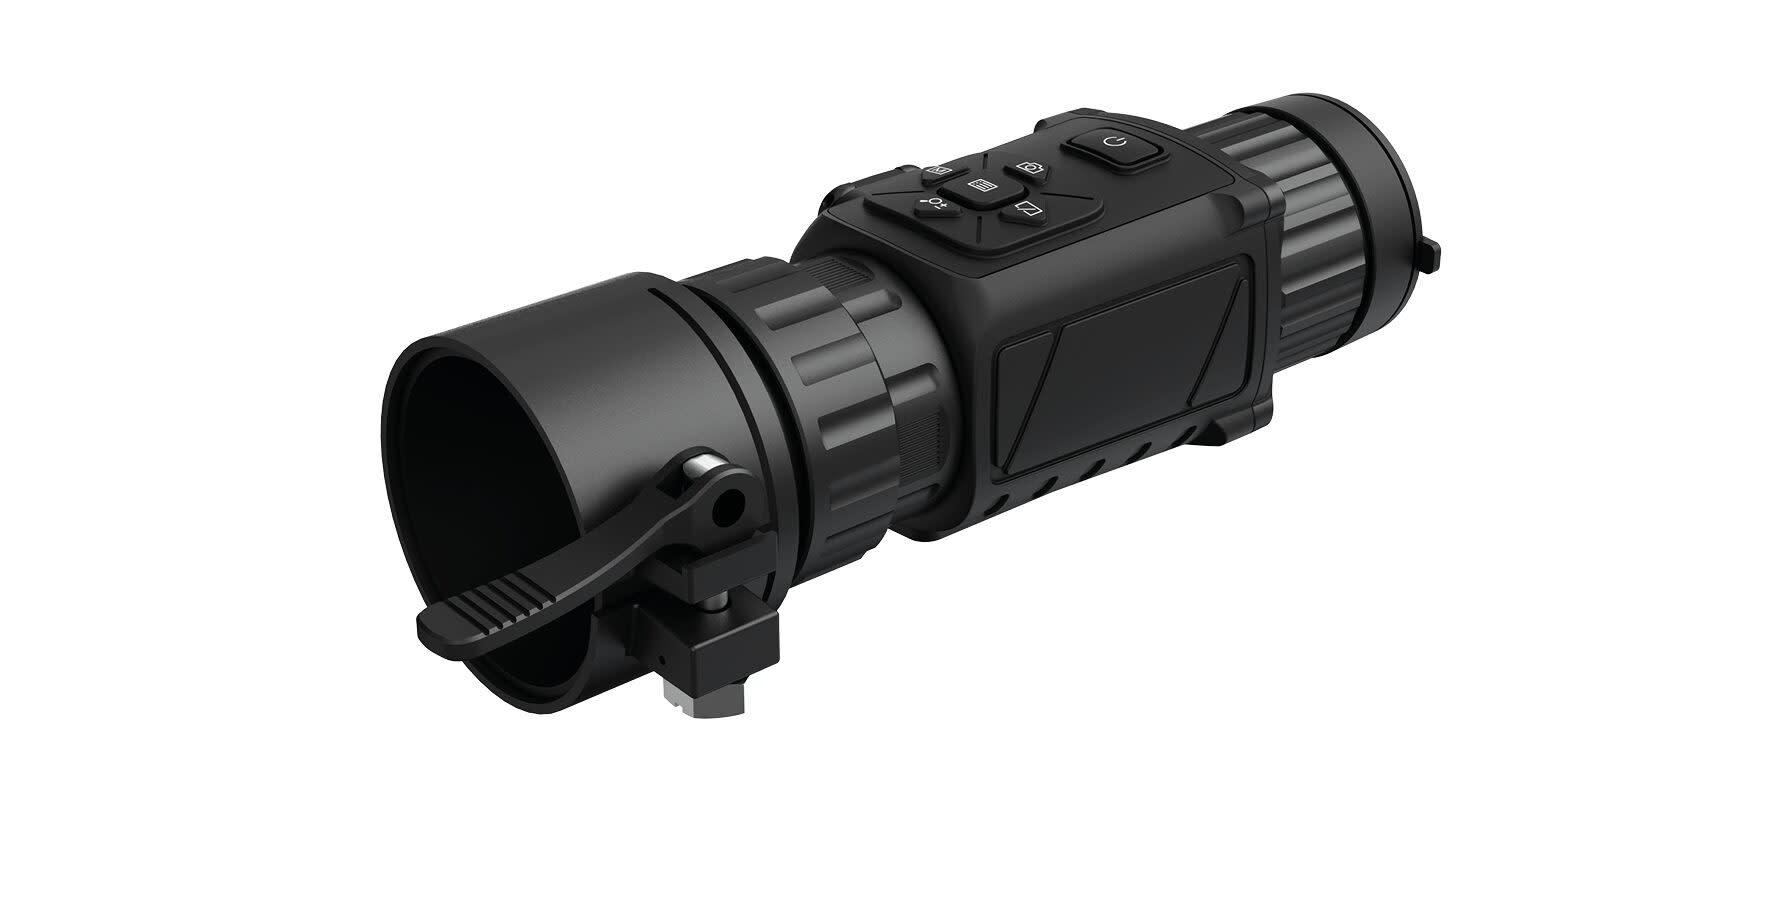 Hikmicro TH35C Clip-On und tragbare Wärmebildkamera